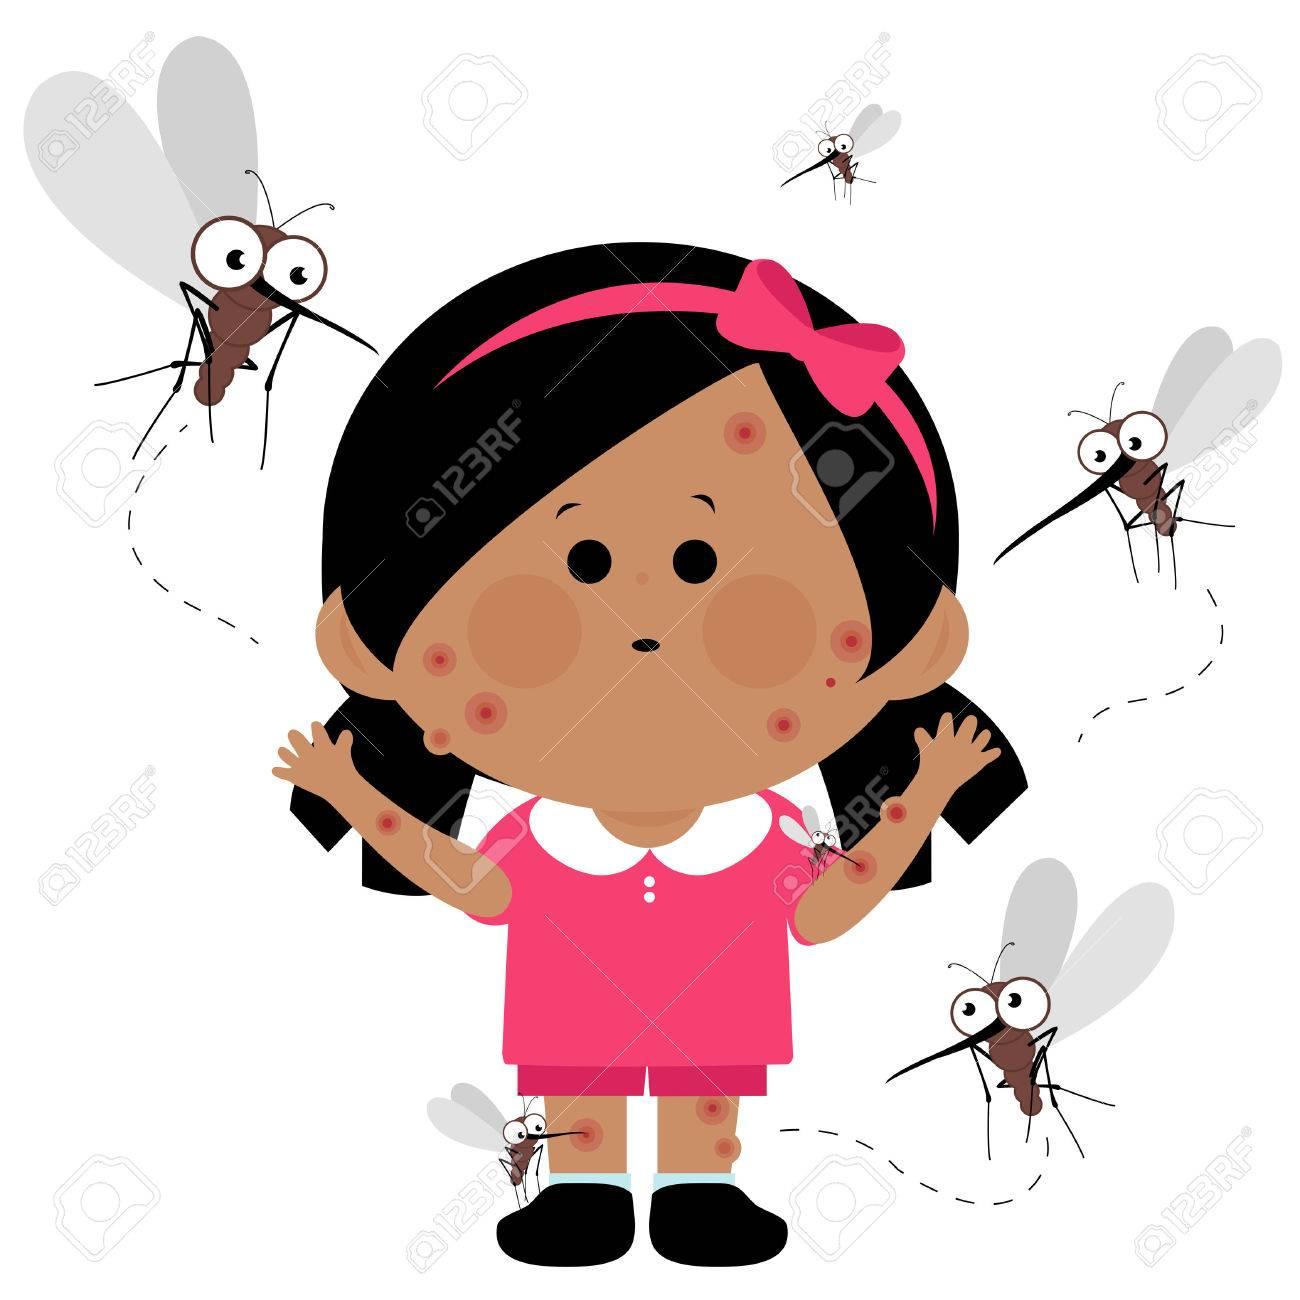 Girl bitten by mosquitoes - 54273239